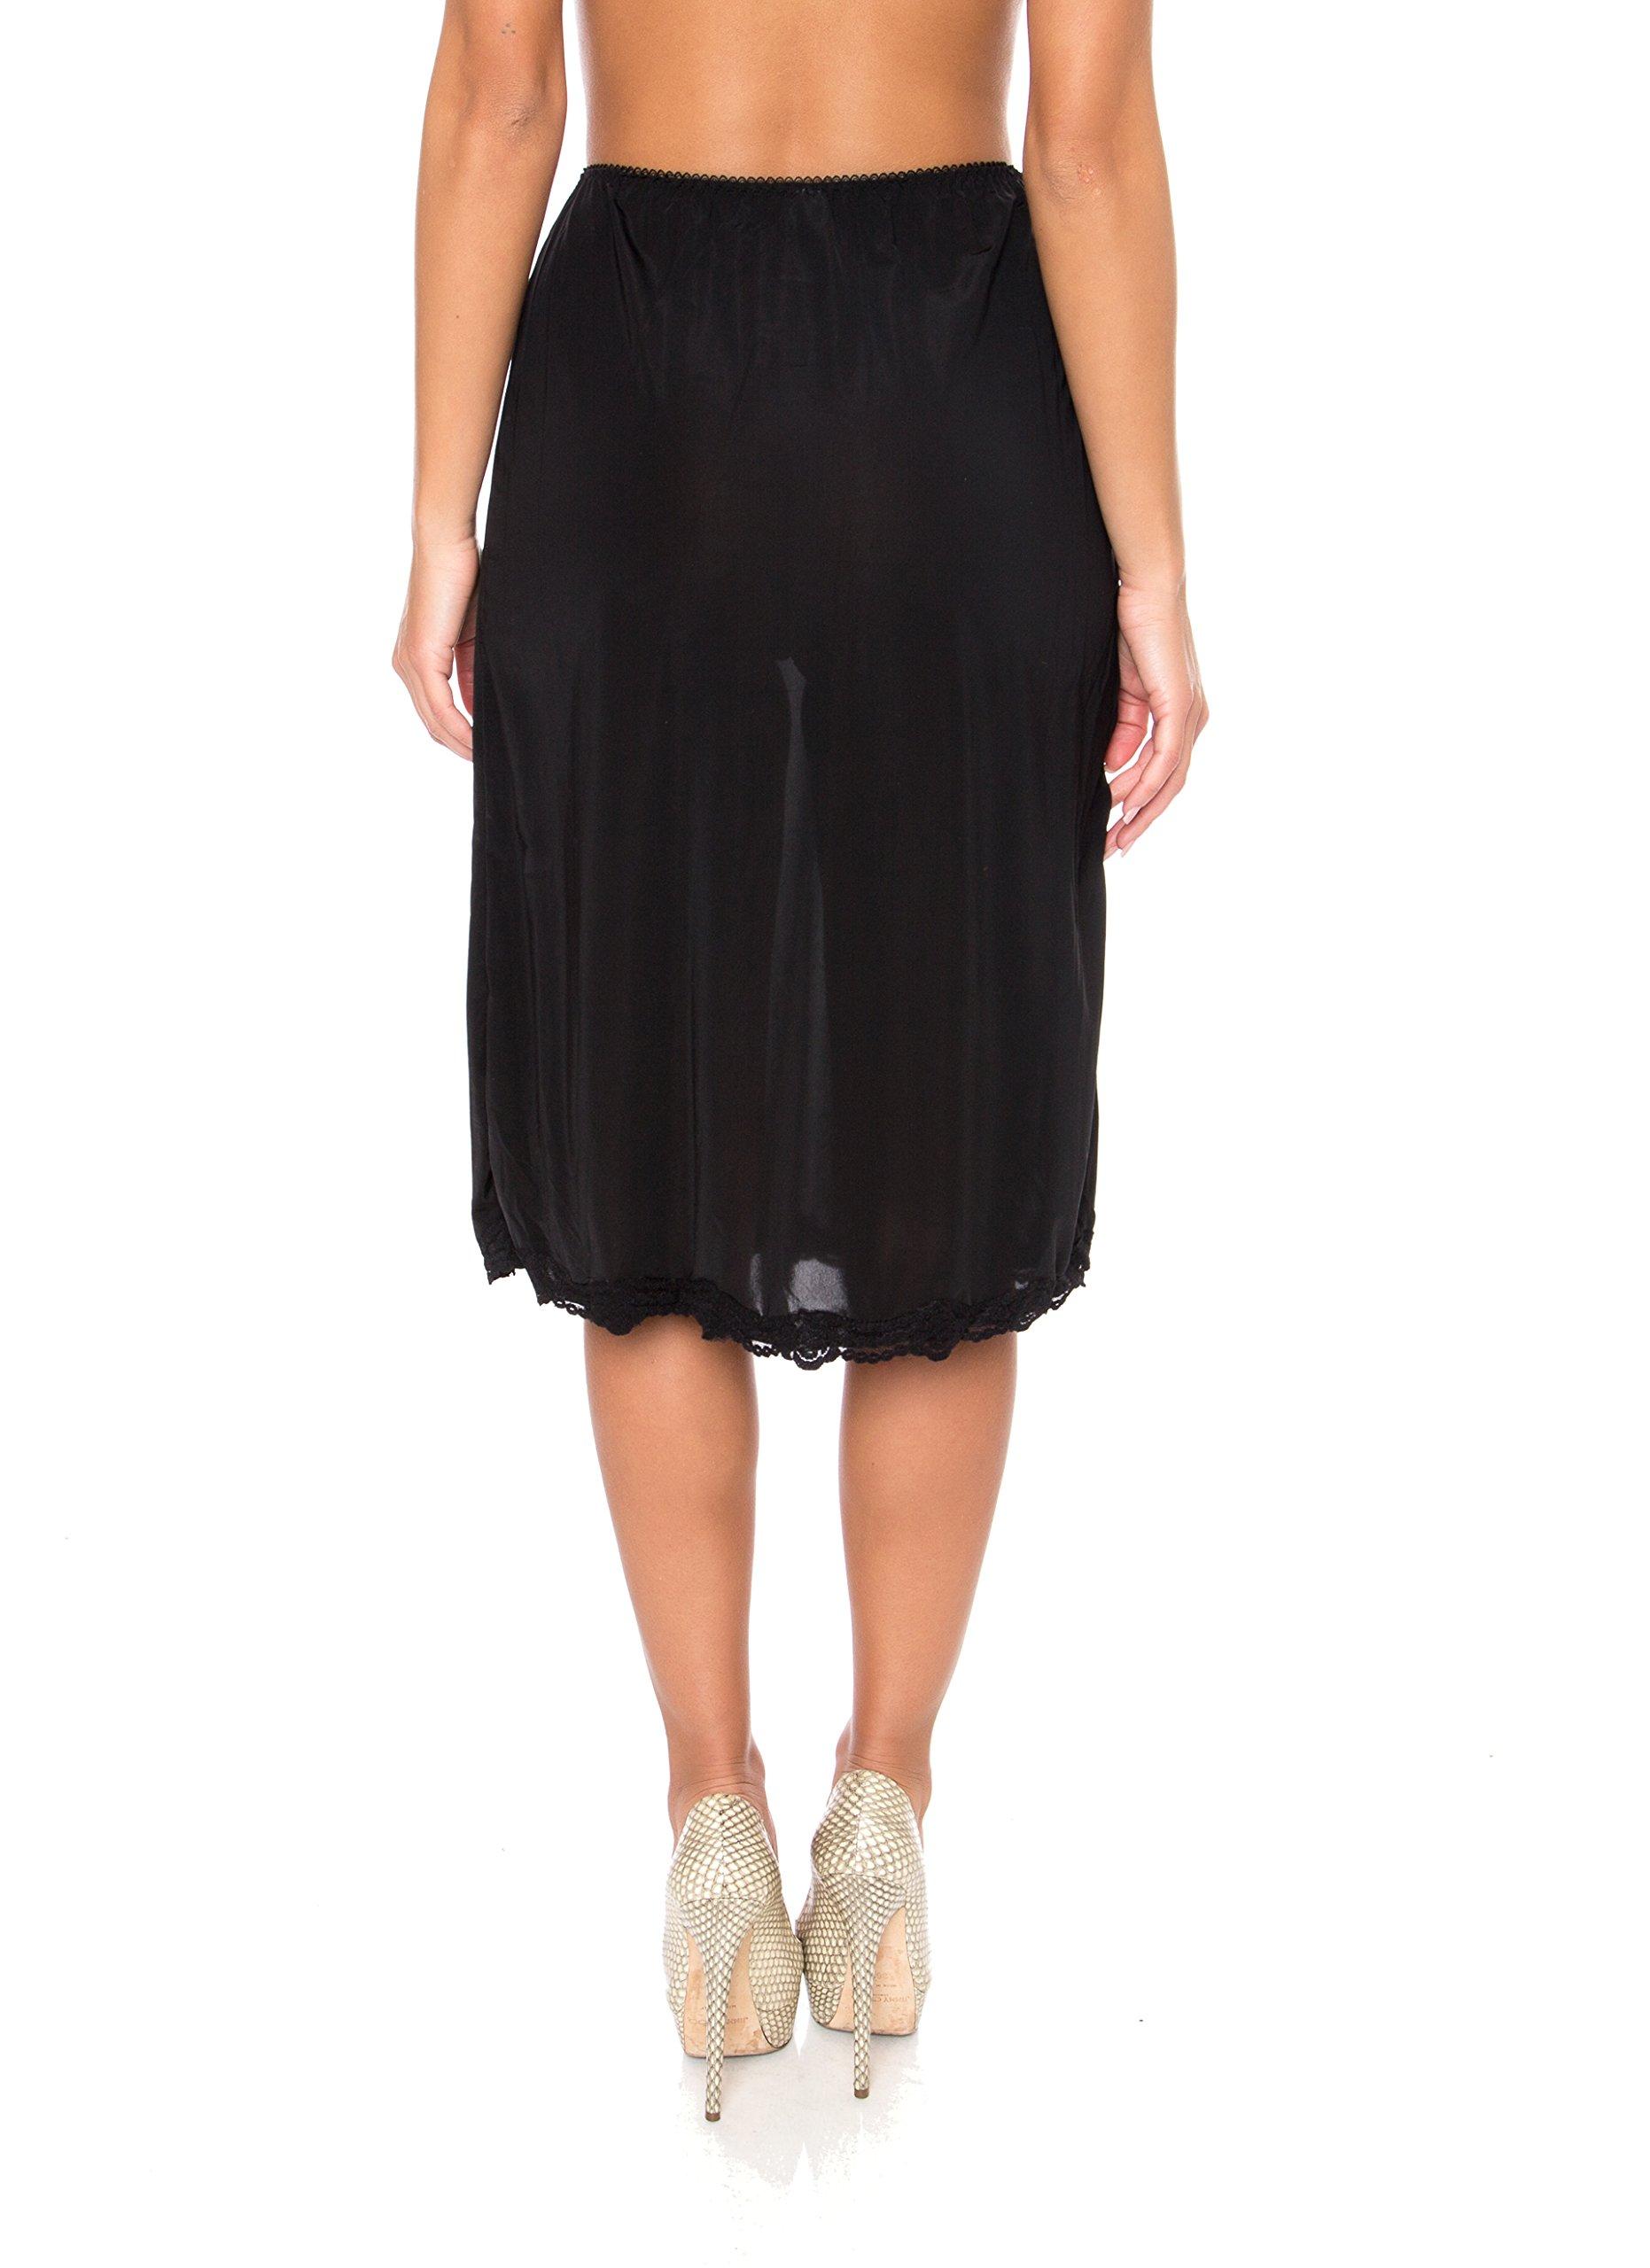 Kathy Ireland Womens Microfiber Half Slip Skirt with Lace Trim Underwear 1X-Large Black